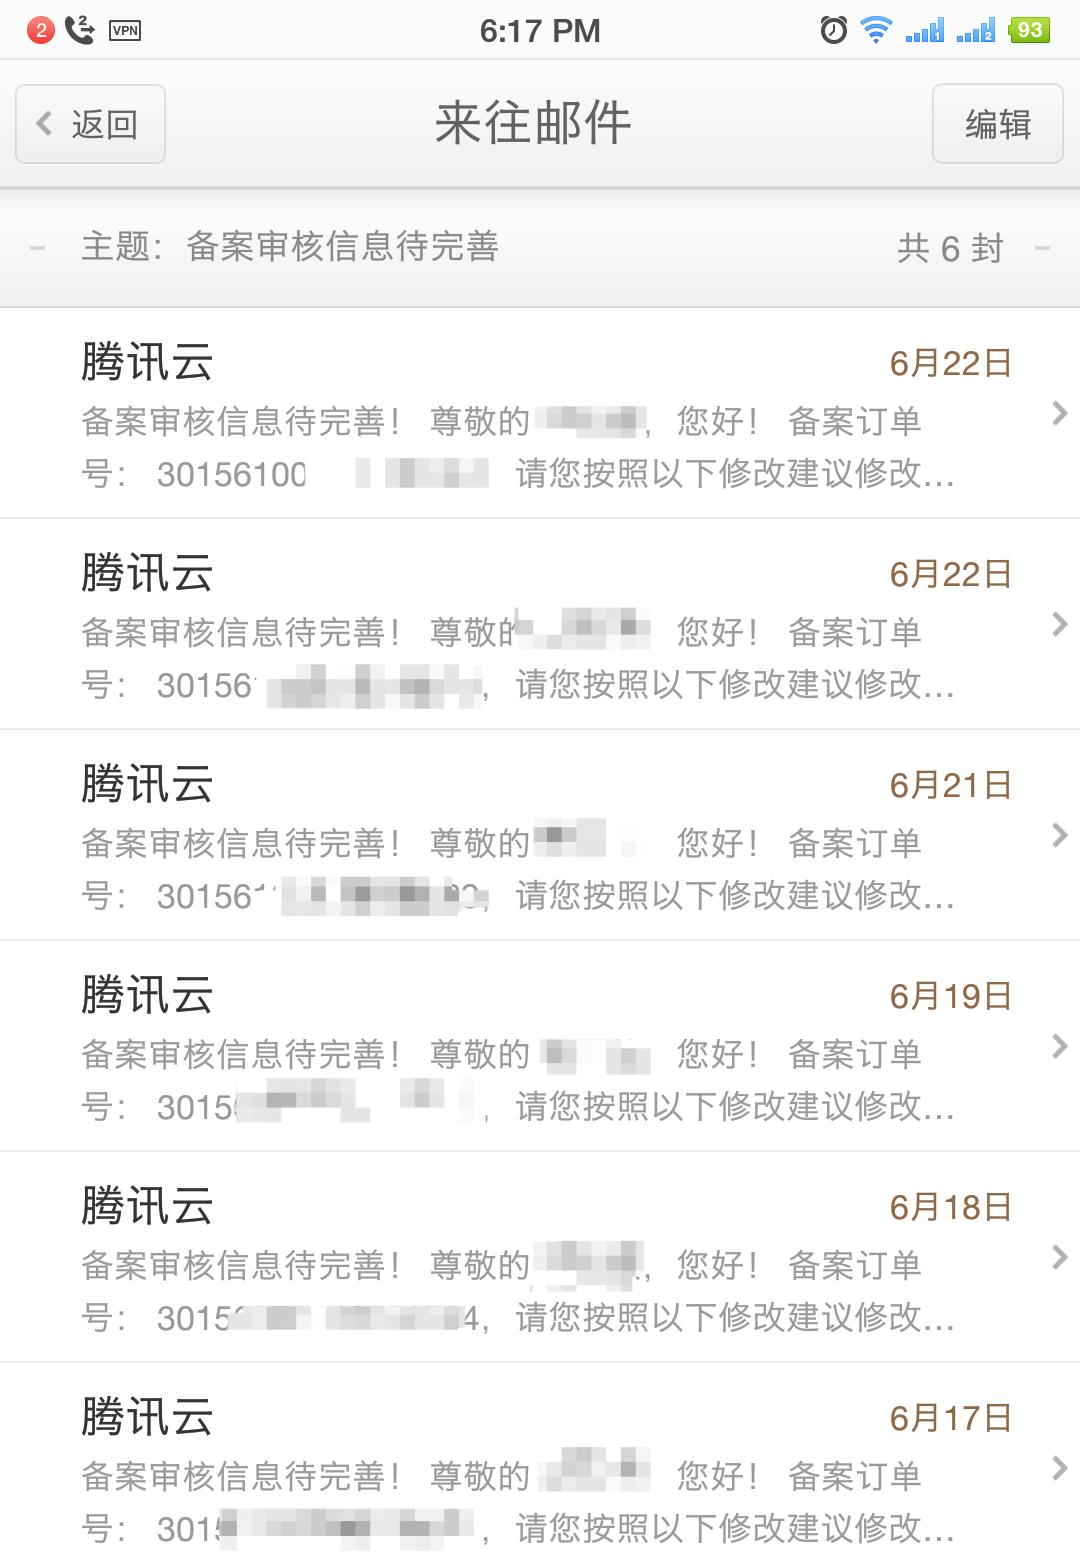 Screenshot_2019-07-03-18-19-36-303.png